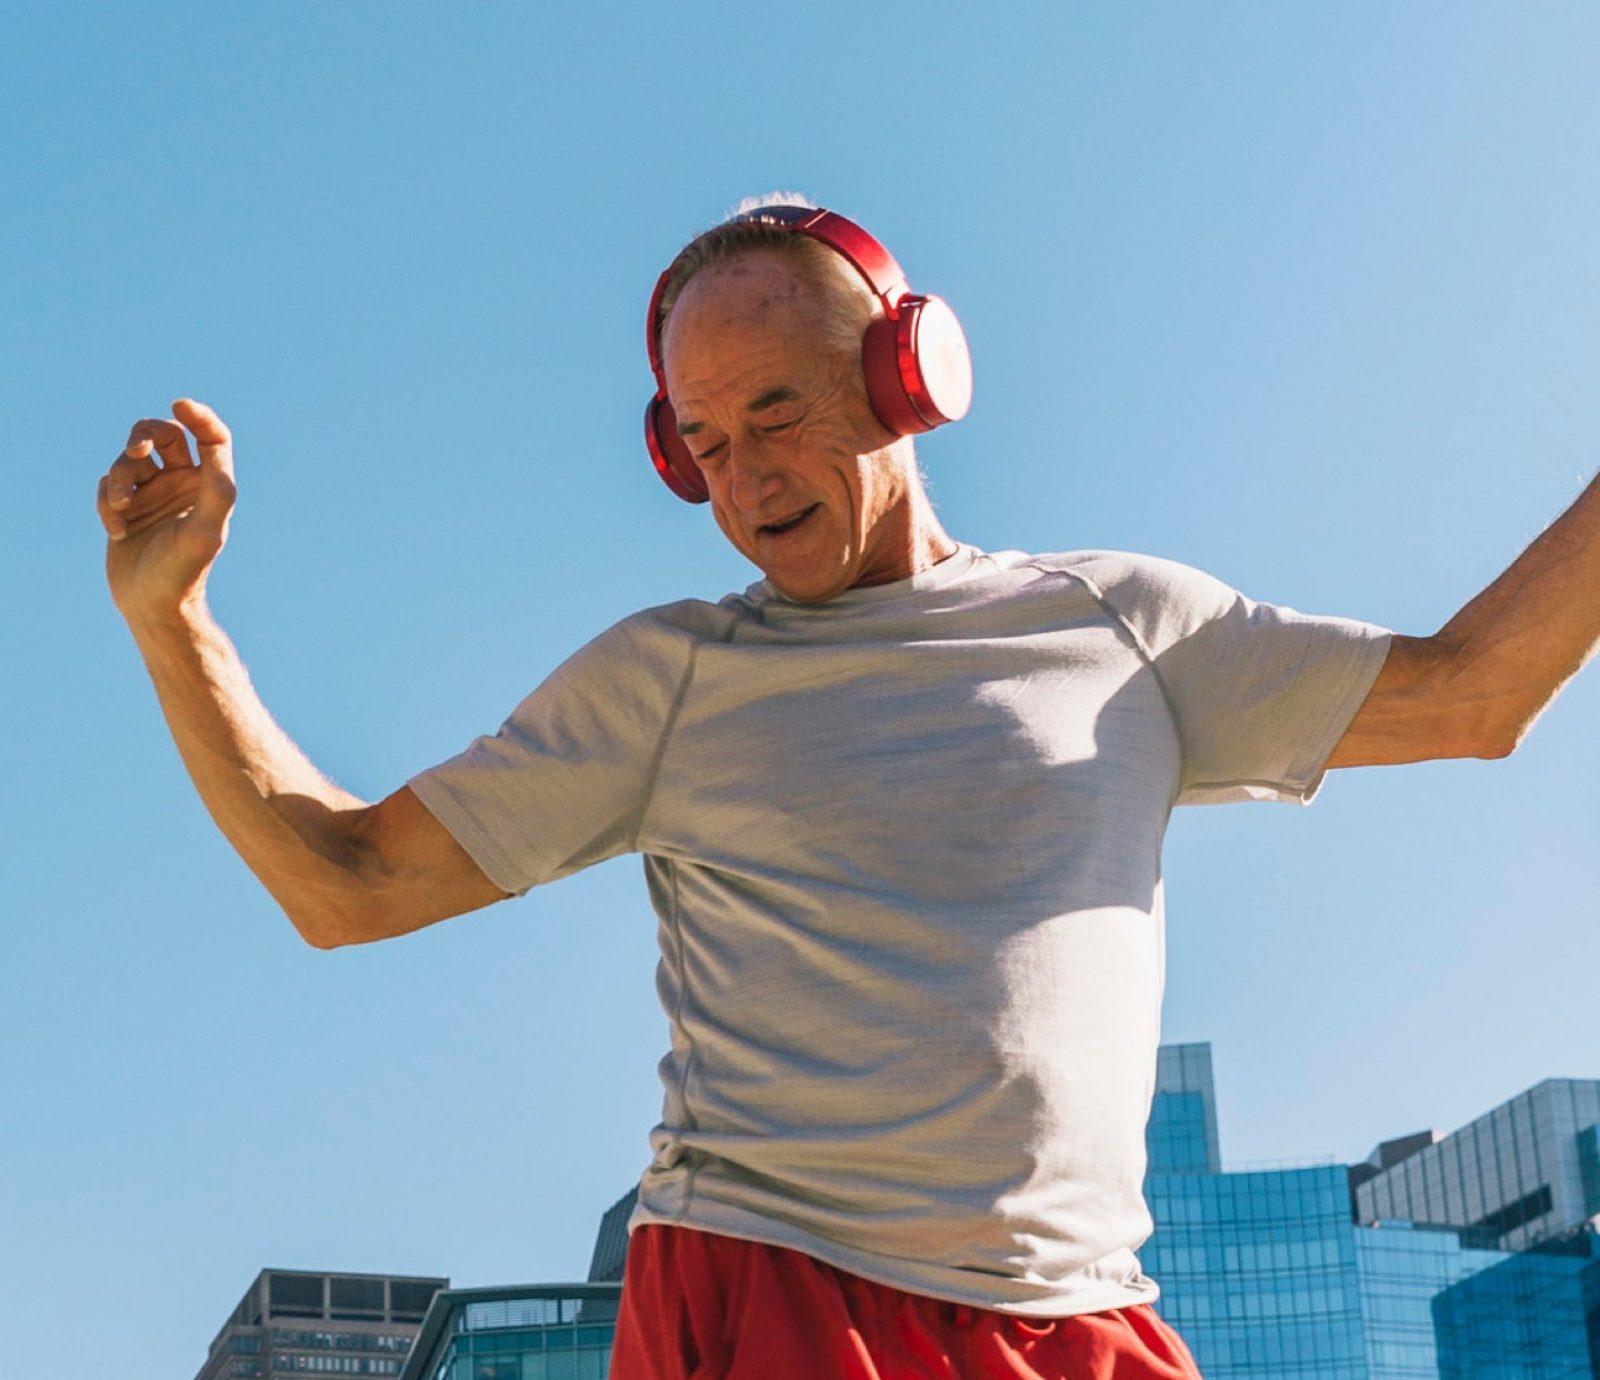 Older man jumping against a blue sky